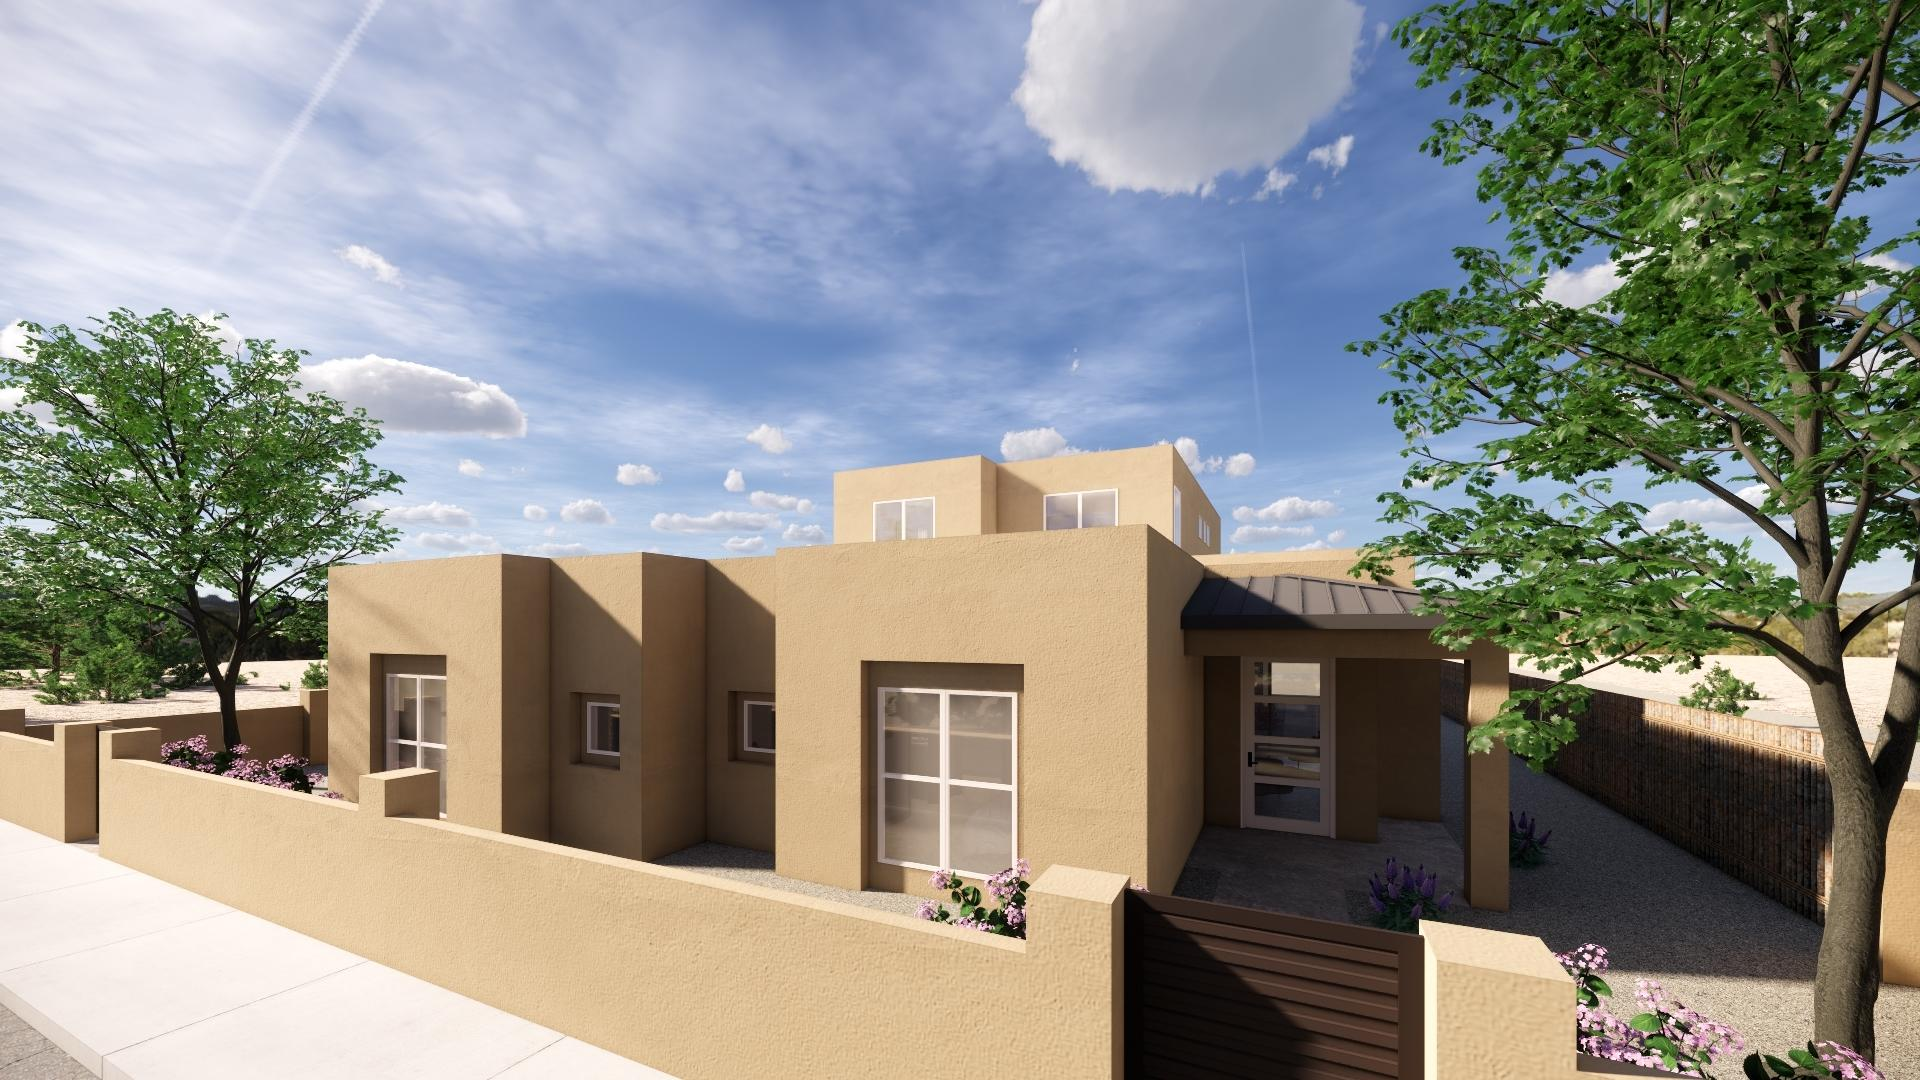 46 BLUE FEATHER Road, Santa Fe, NM 87508 - Santa Fe, NM real estate listing